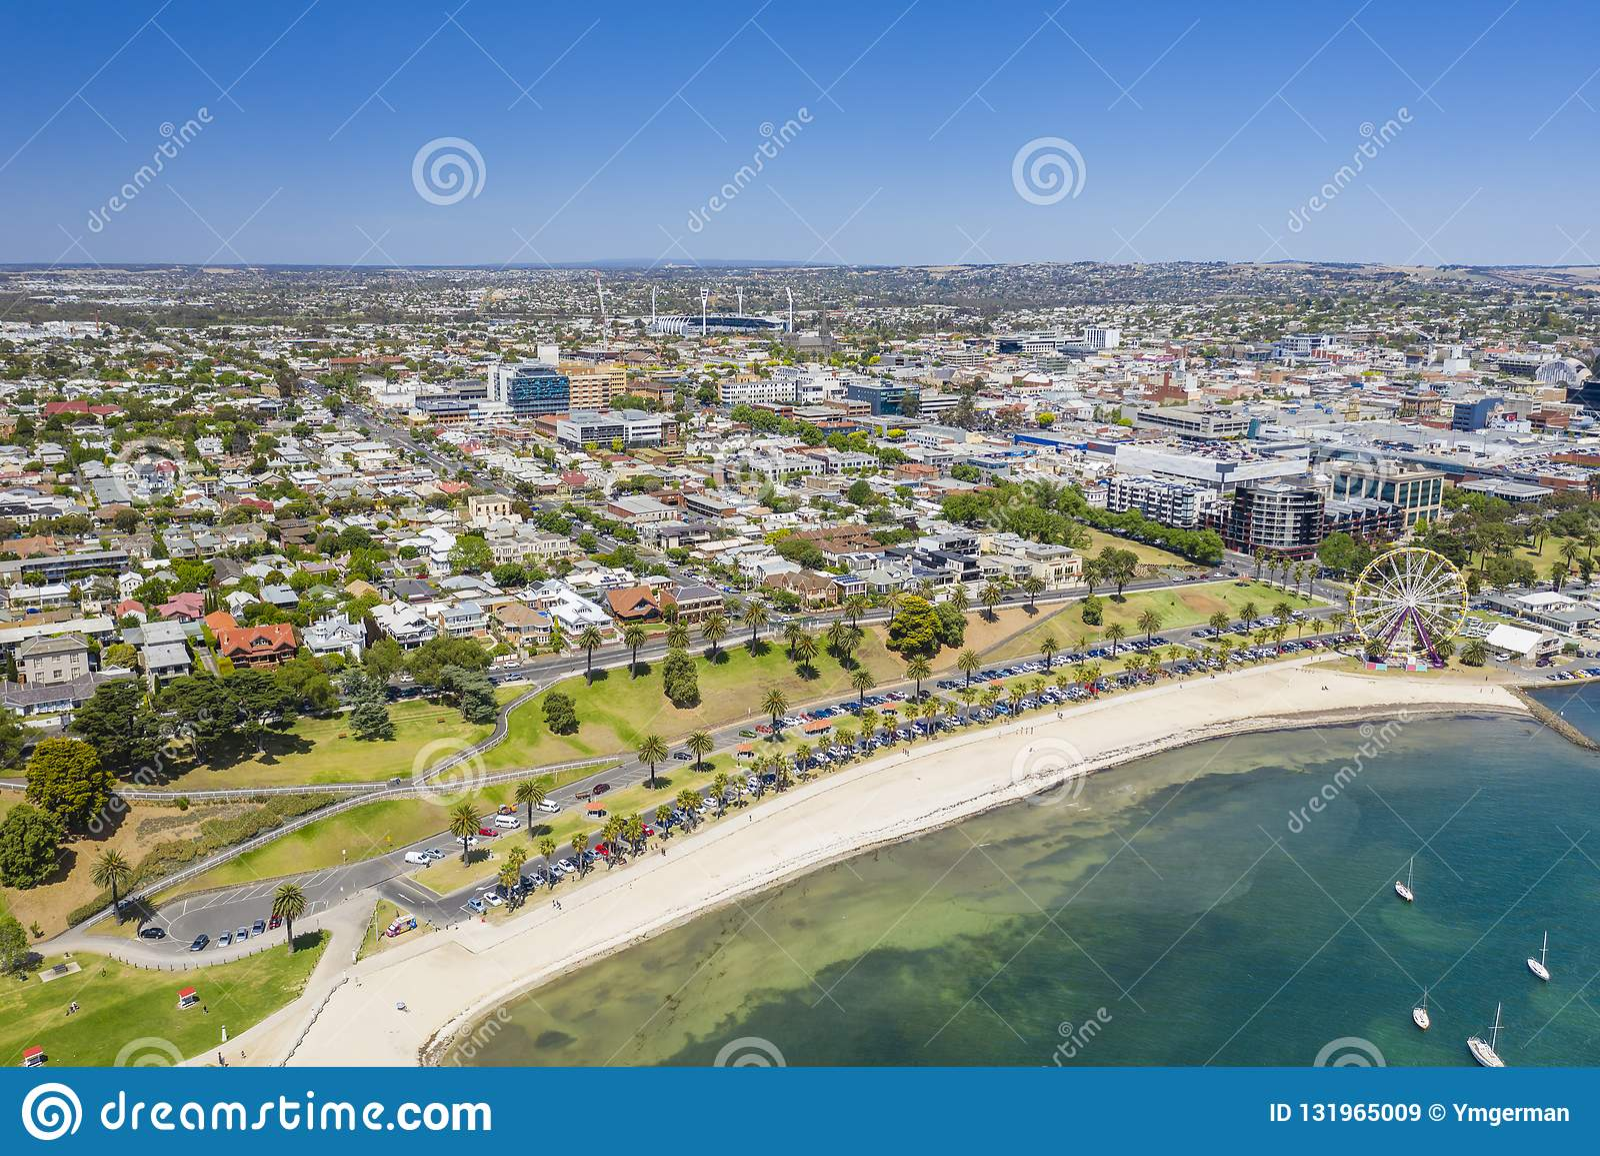 Foto aérea de Geelong en Victoria, Australia